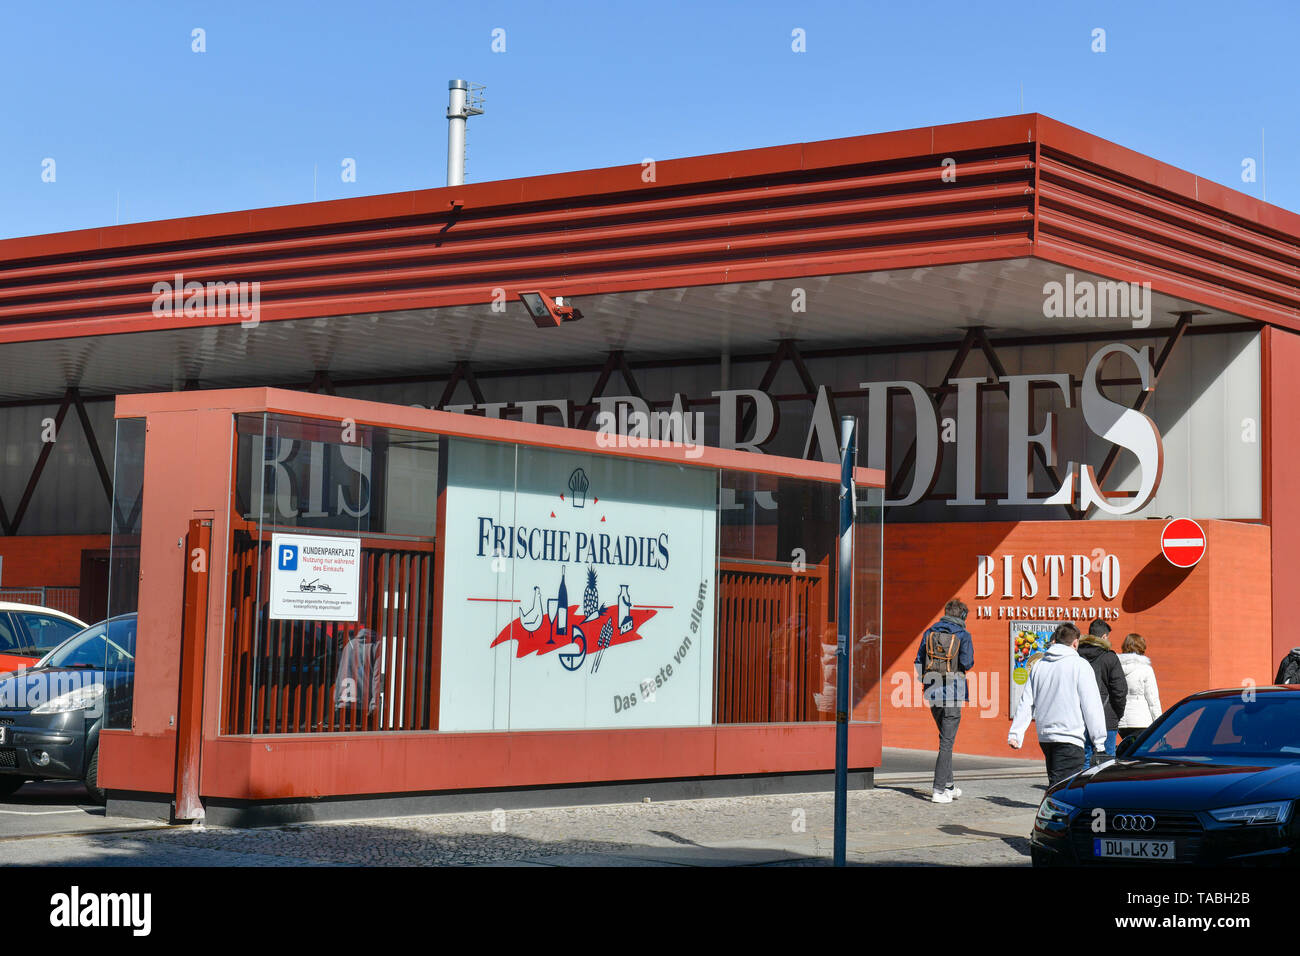 Freshness paradise, Morsestrasse, Charlottenburg, Berlin, Germany, Frischeparadies, Morsestraße, Deutschland - Stock Image